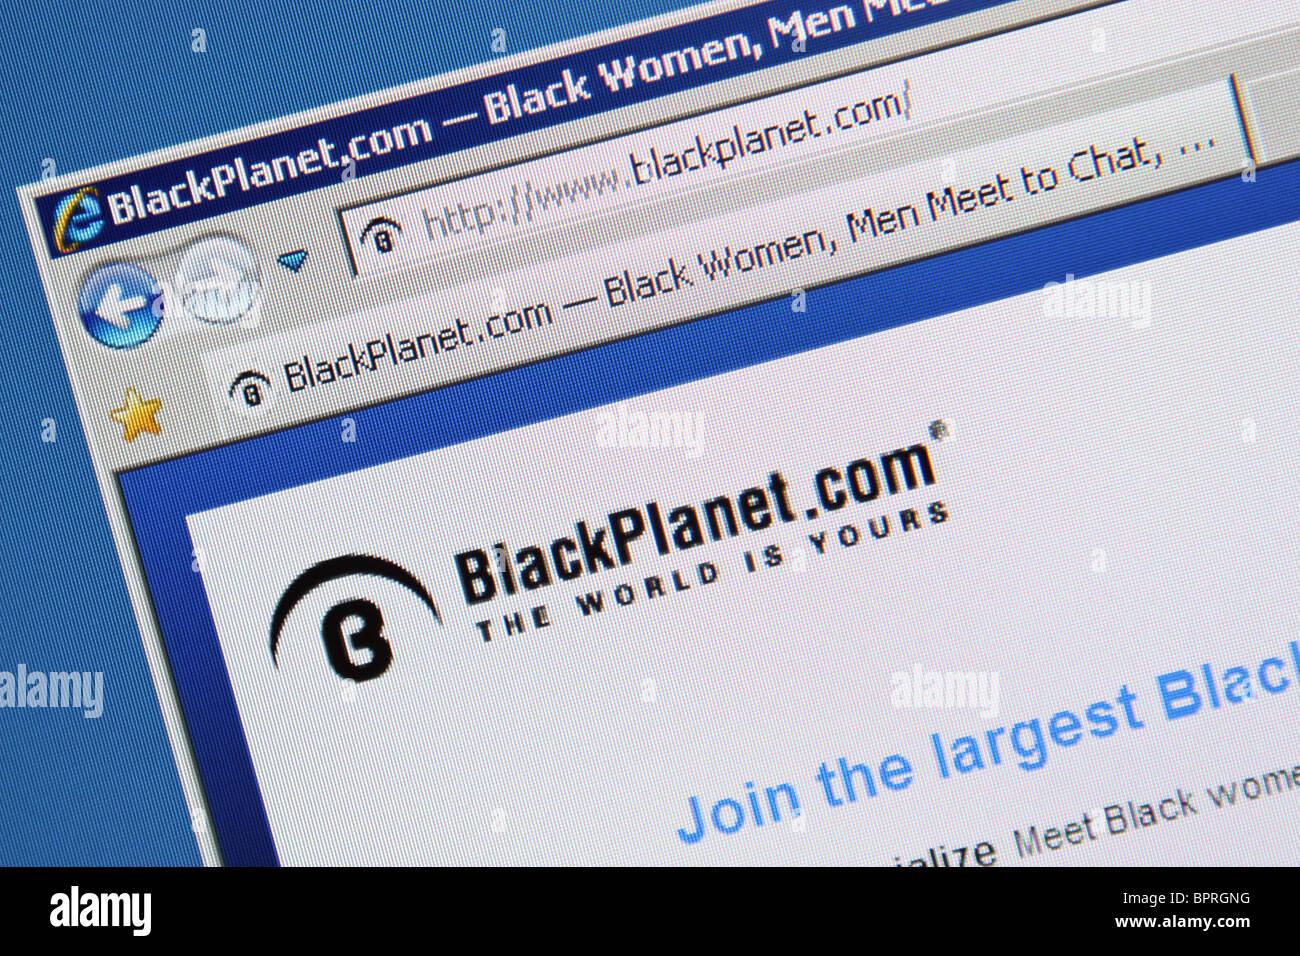 Black planet chat.com